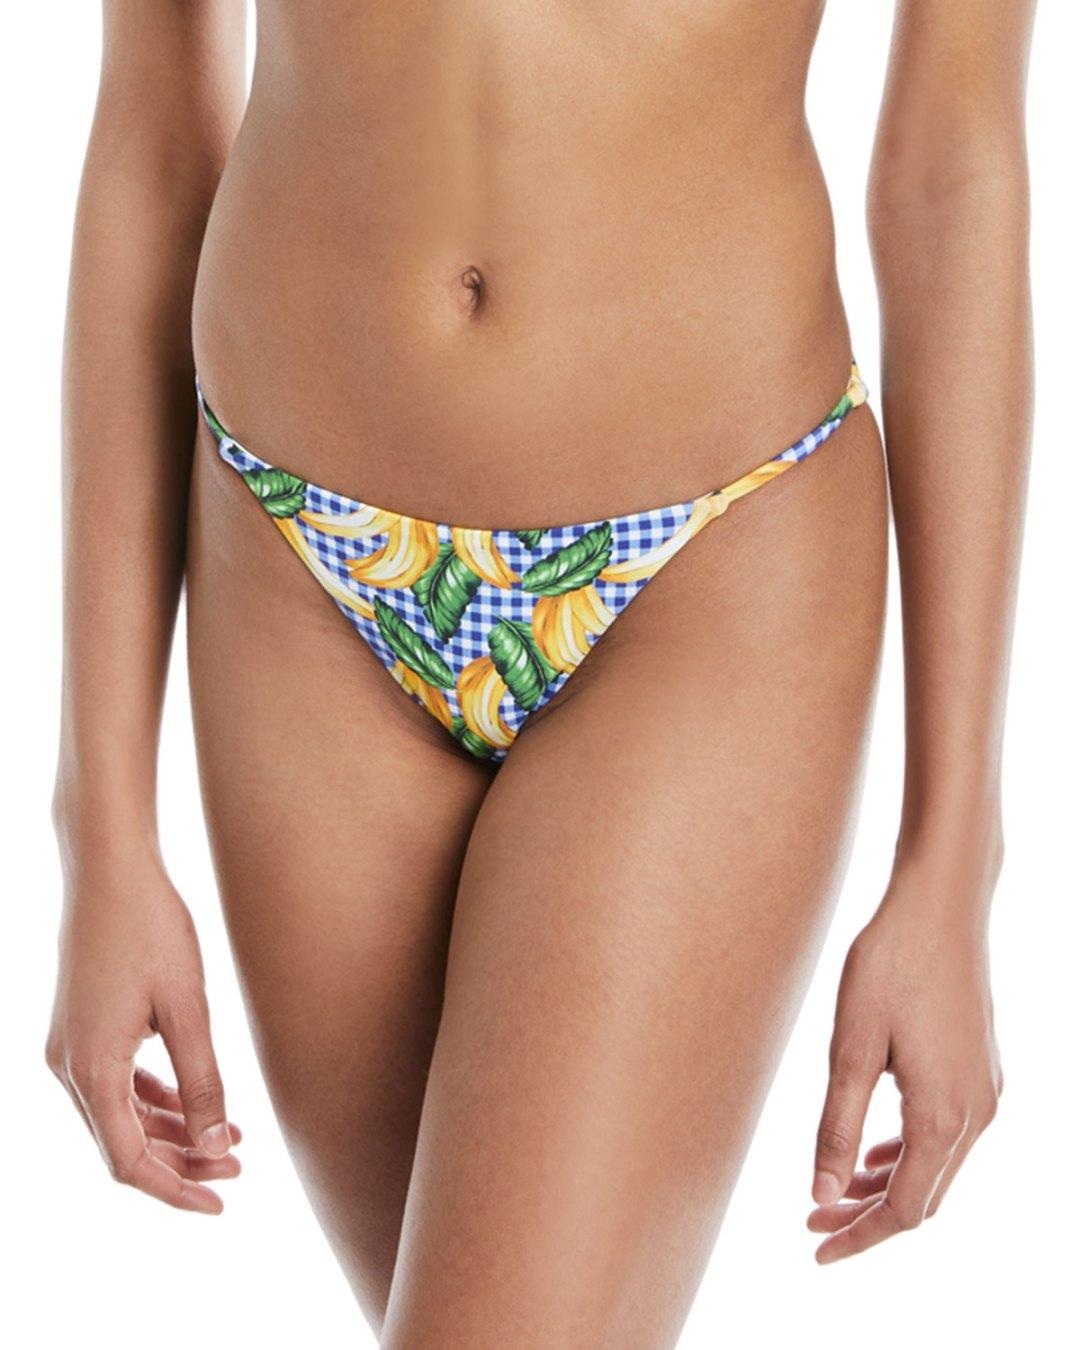 58935180e2 ONIA – Rochelle Cheeky Bikini Swim Bottom – Bergdorf Goodman (Neiman  Marcus) –  95